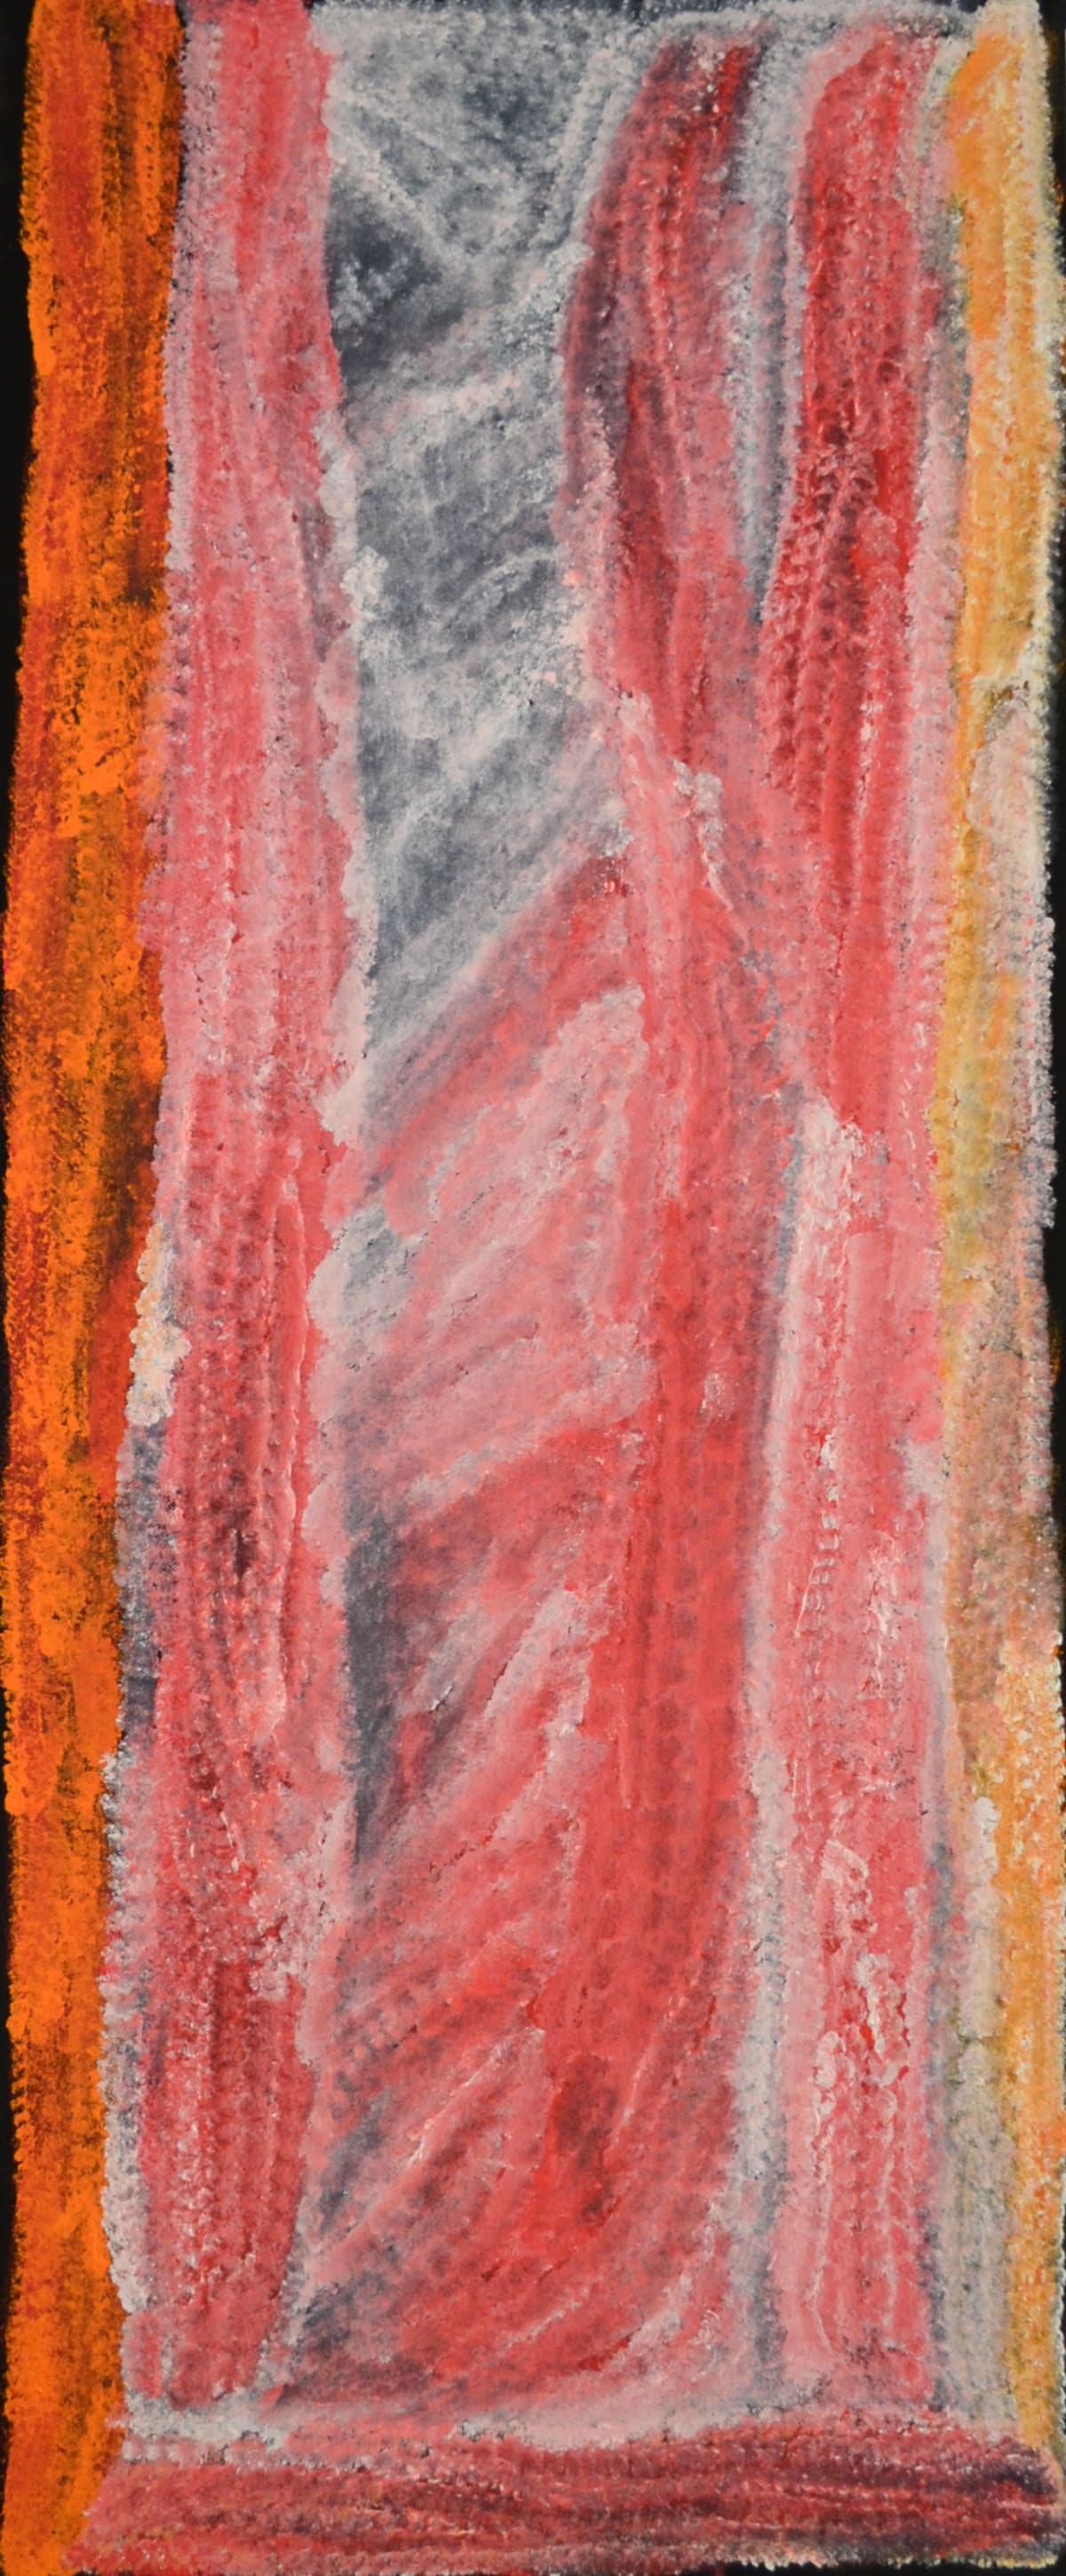 Lydia Balbal Jawani Jawani acrylic on canvas 101 x 40 cm